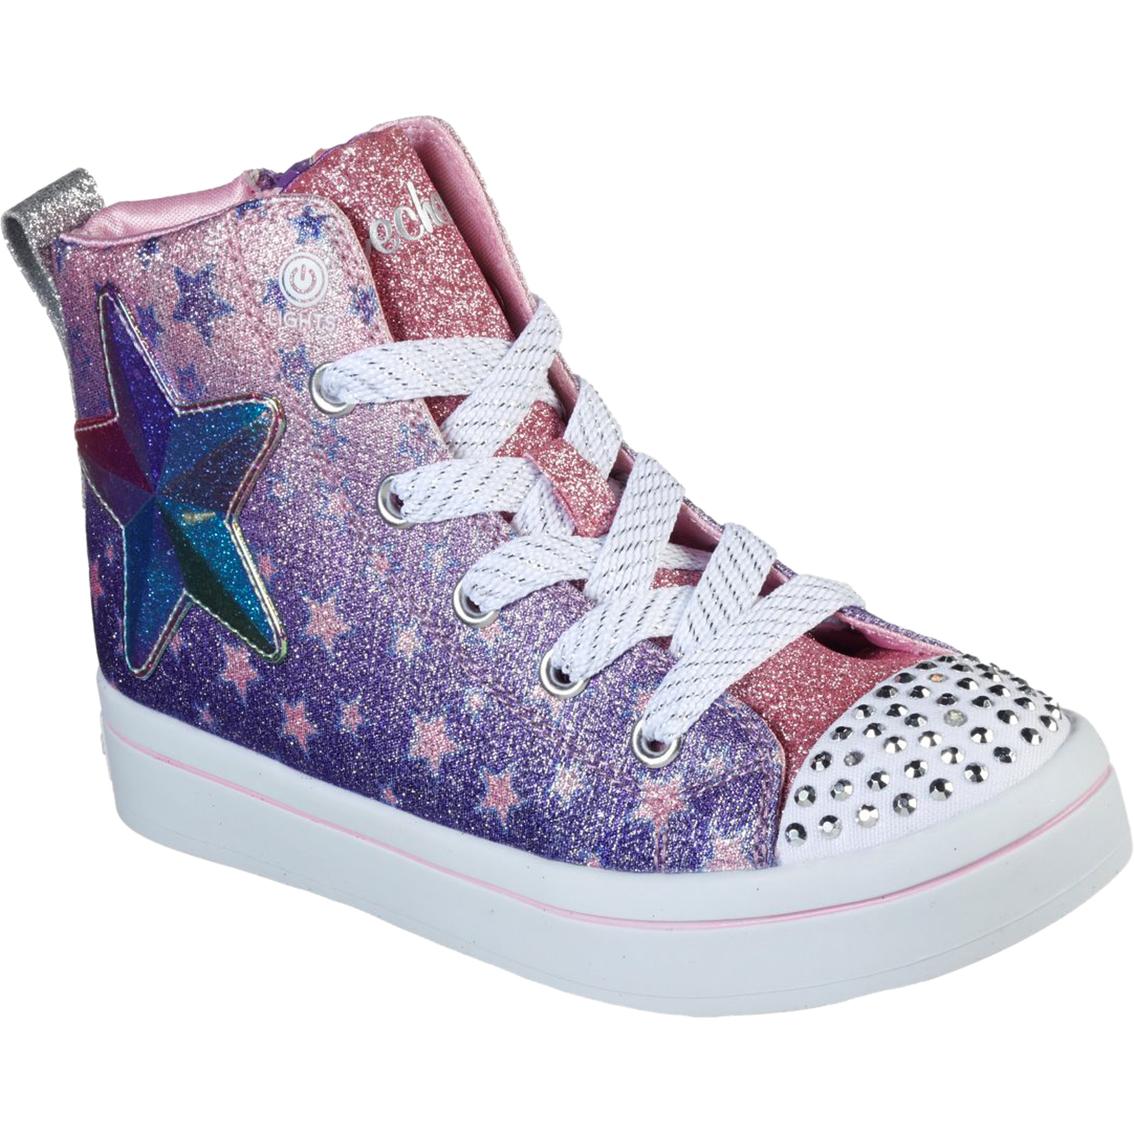 Skechers Preschool Girls Twinkle Toes